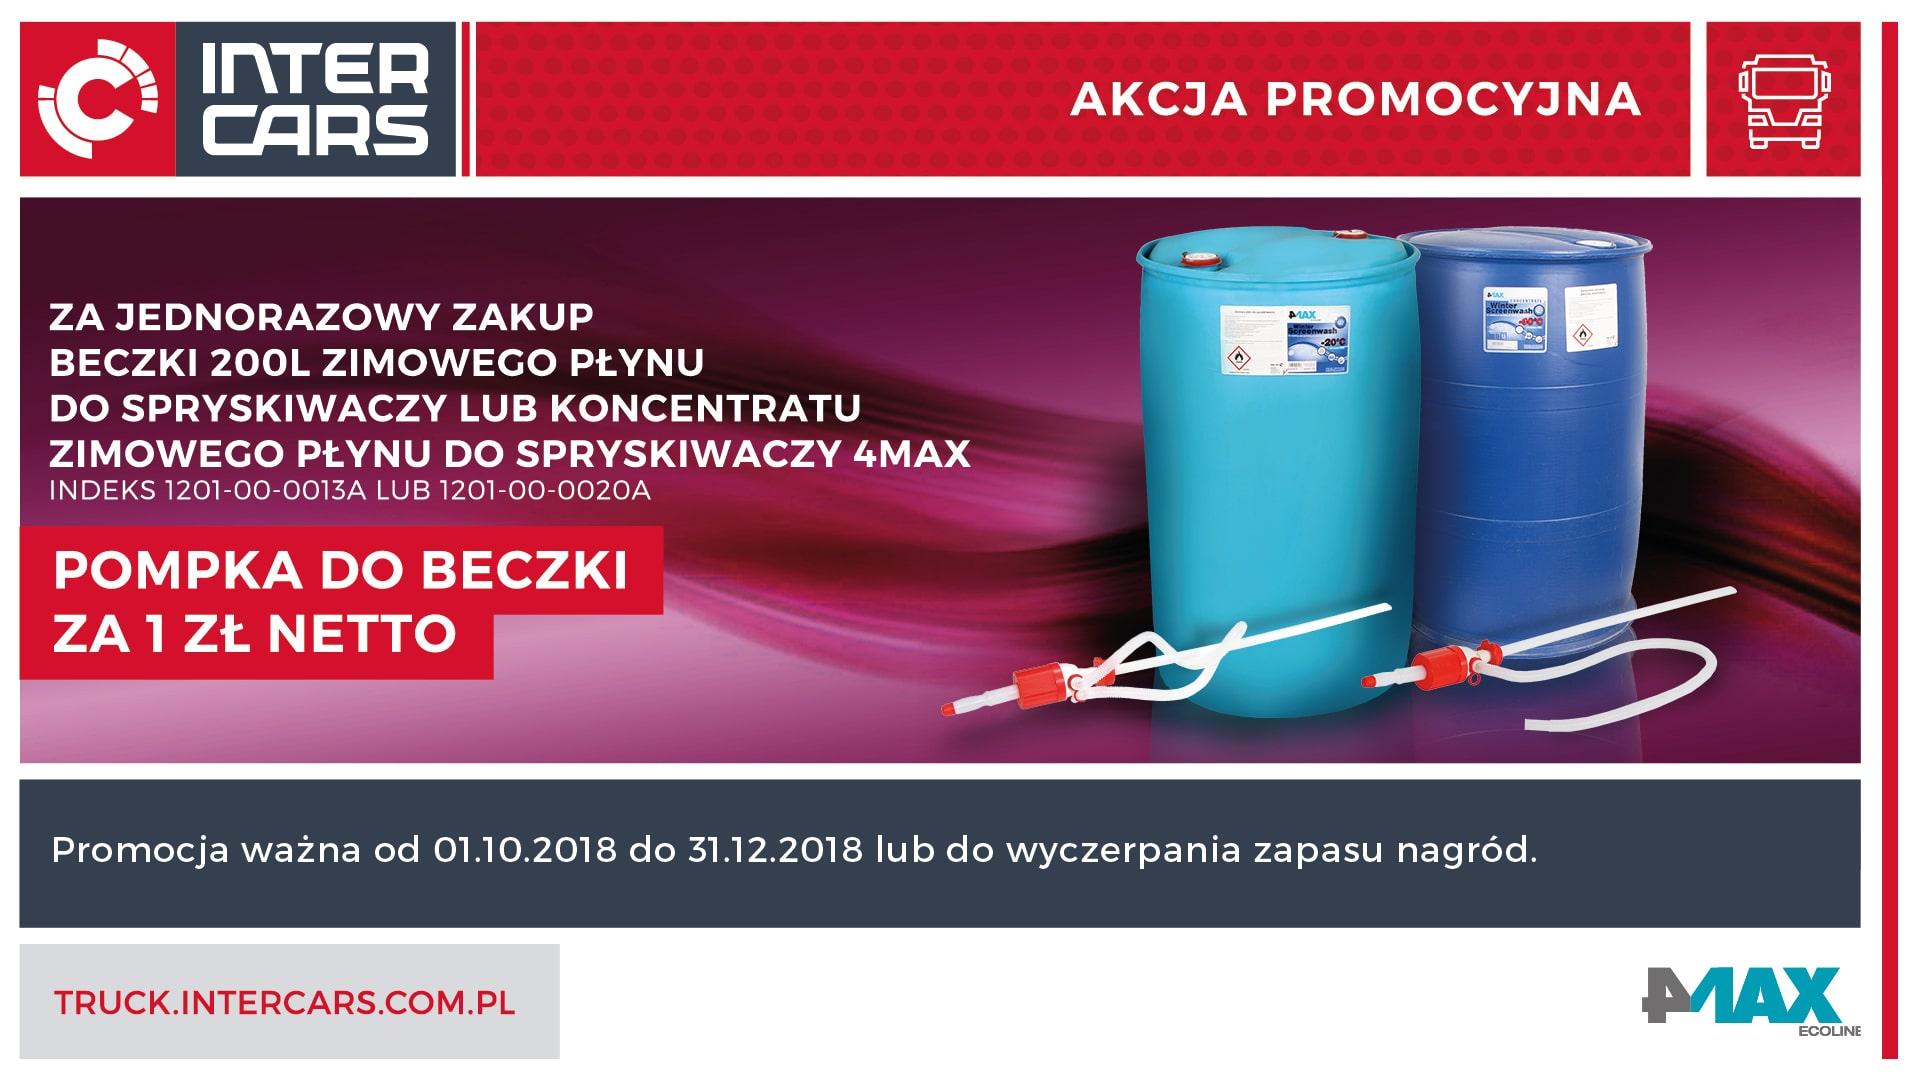 promocja_za_zakup_beczki_pompka_za_1zl_1920x1080_plazma.jpg